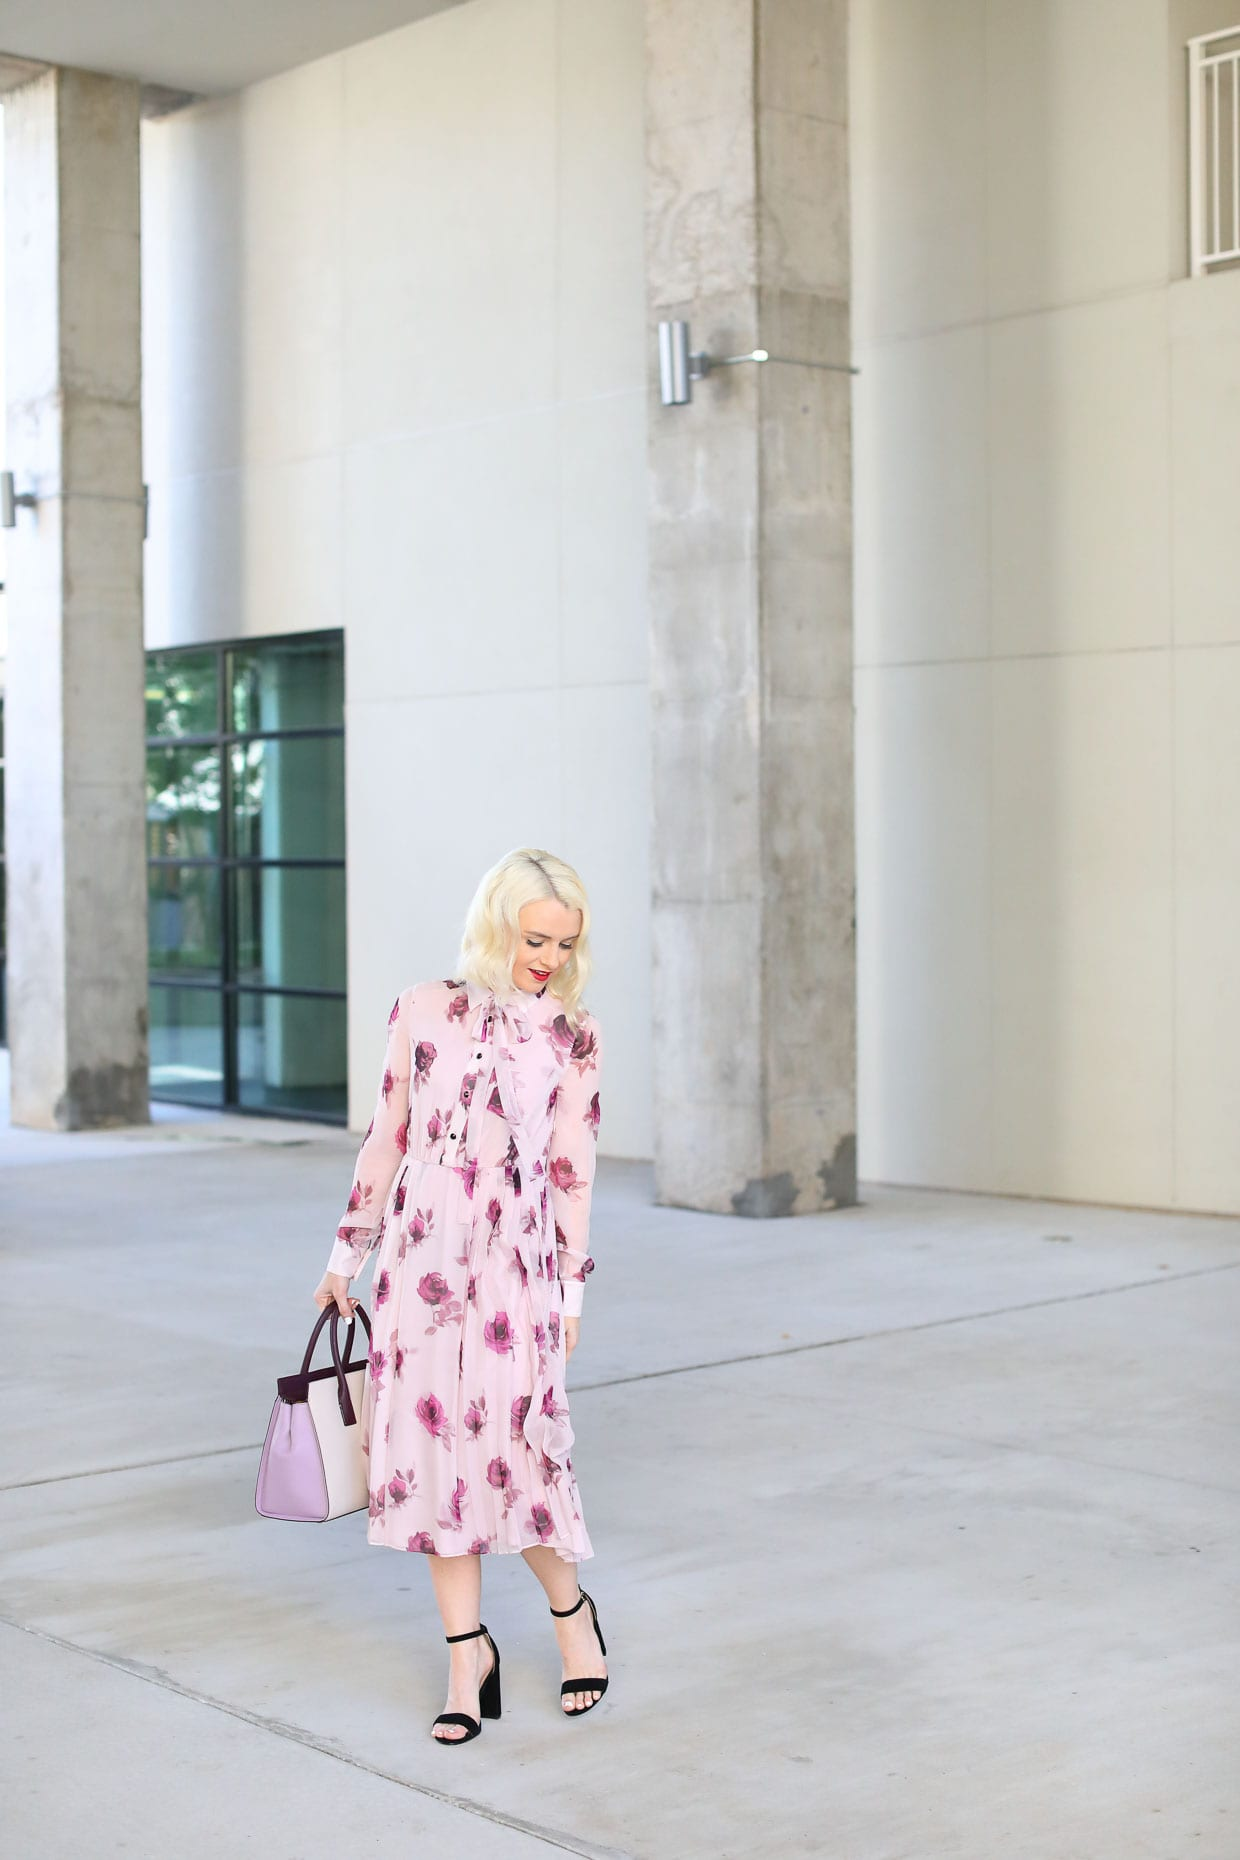 Kate Spade Rose Chiffon Dress - Poor Little It Girl